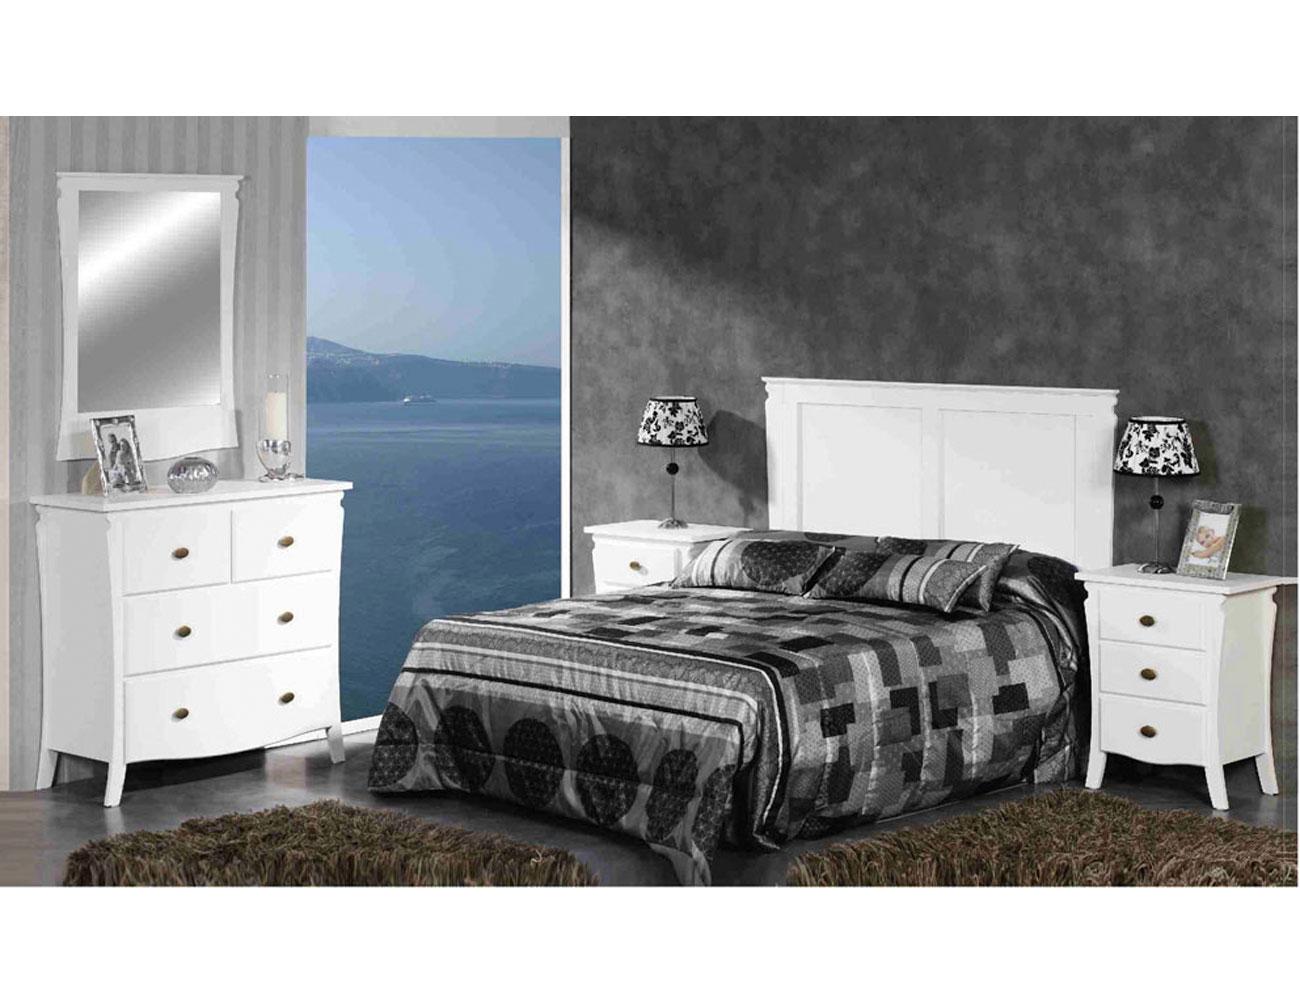 Dormitorio matrimonio blanco lacado madera dm7